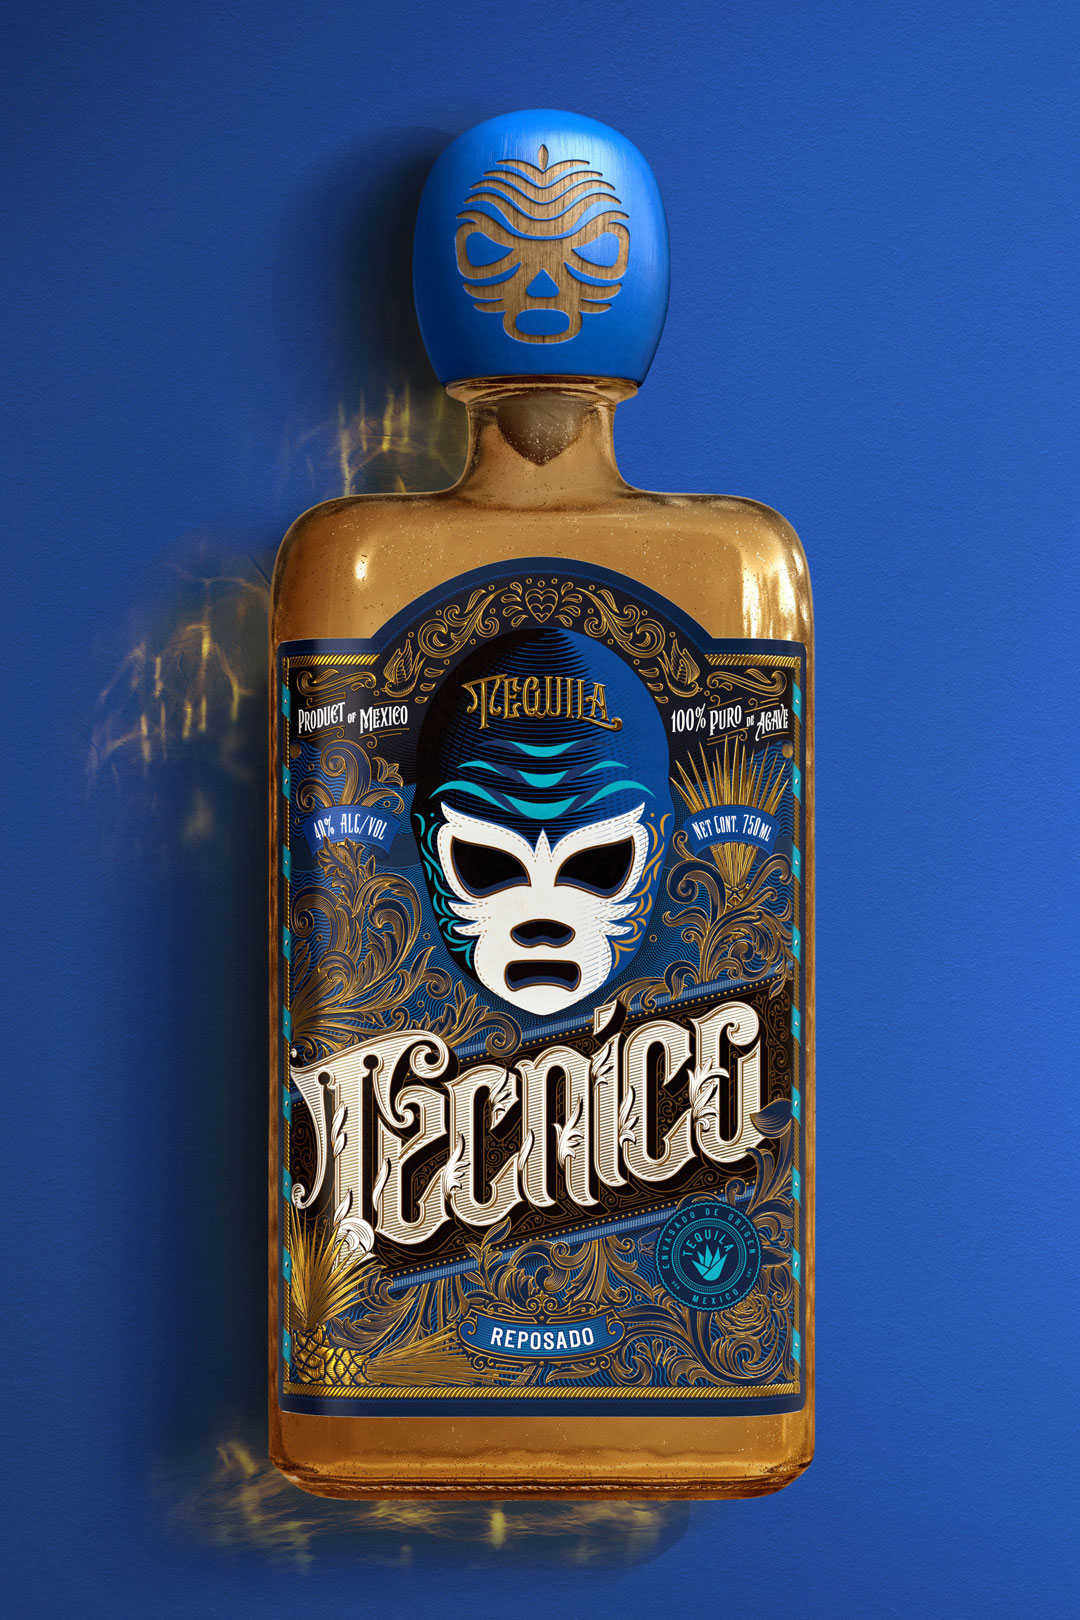 Tequila Blau